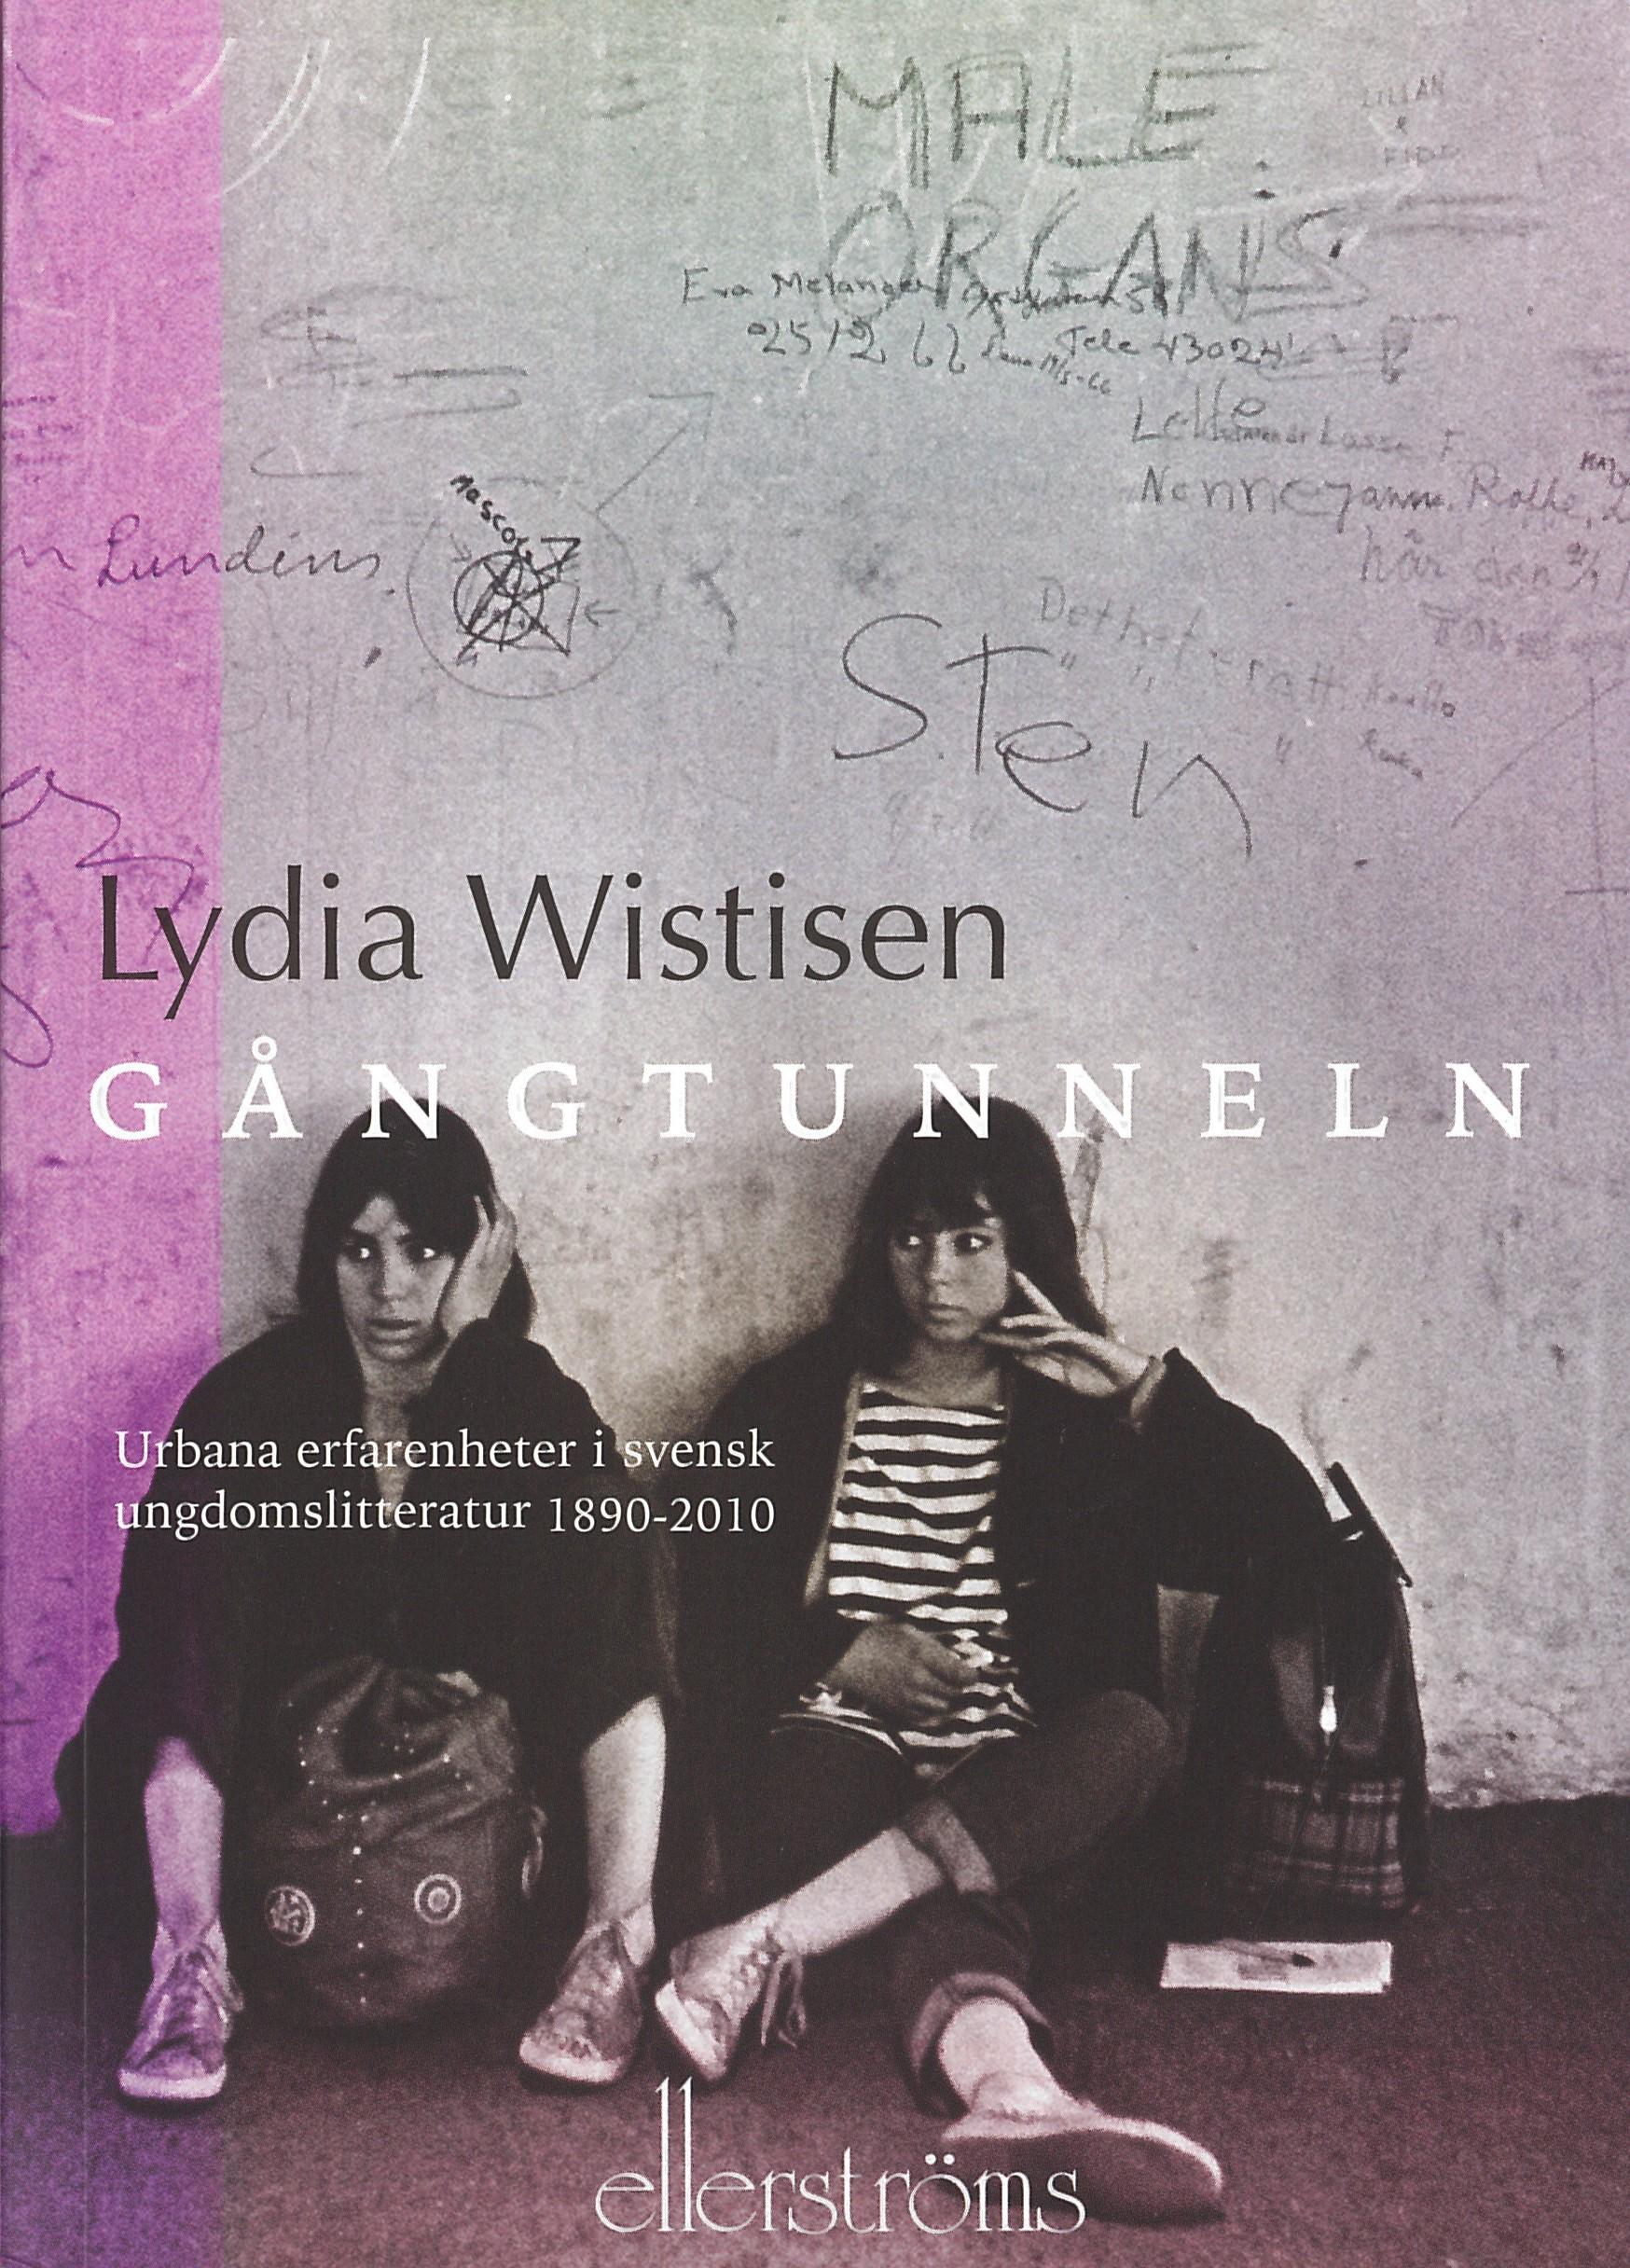 Lydia Wistisen: Gångtunneln